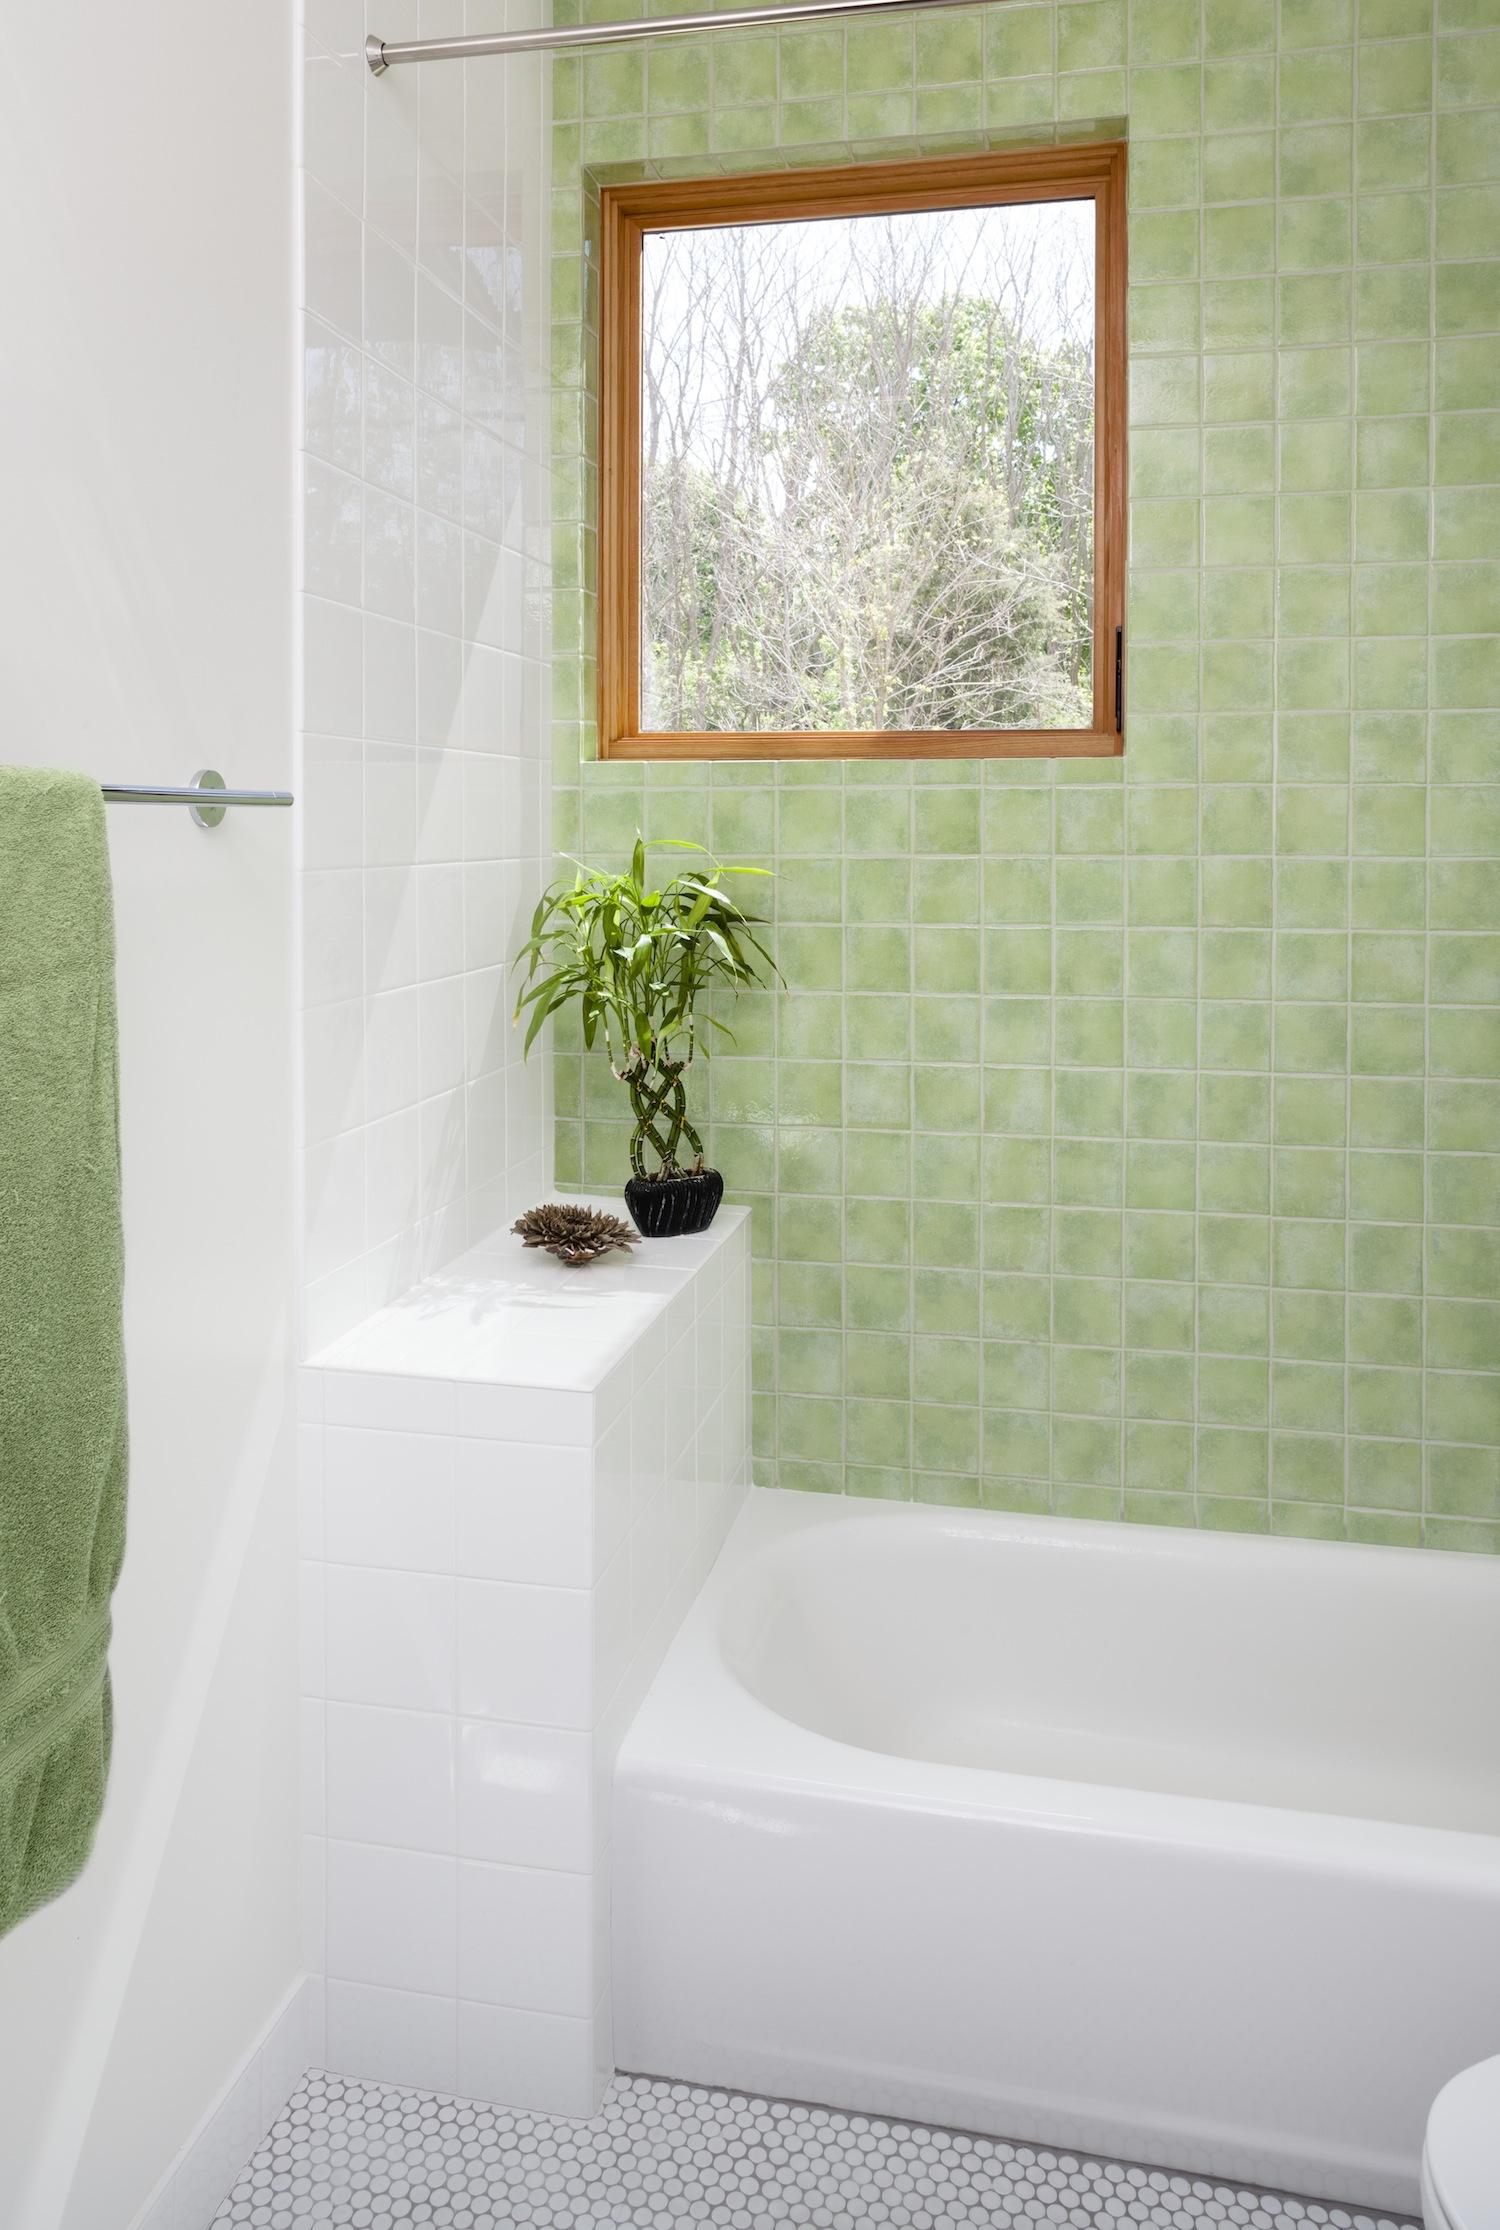 schickel-construction-seneca-lake-bathroom.jpg